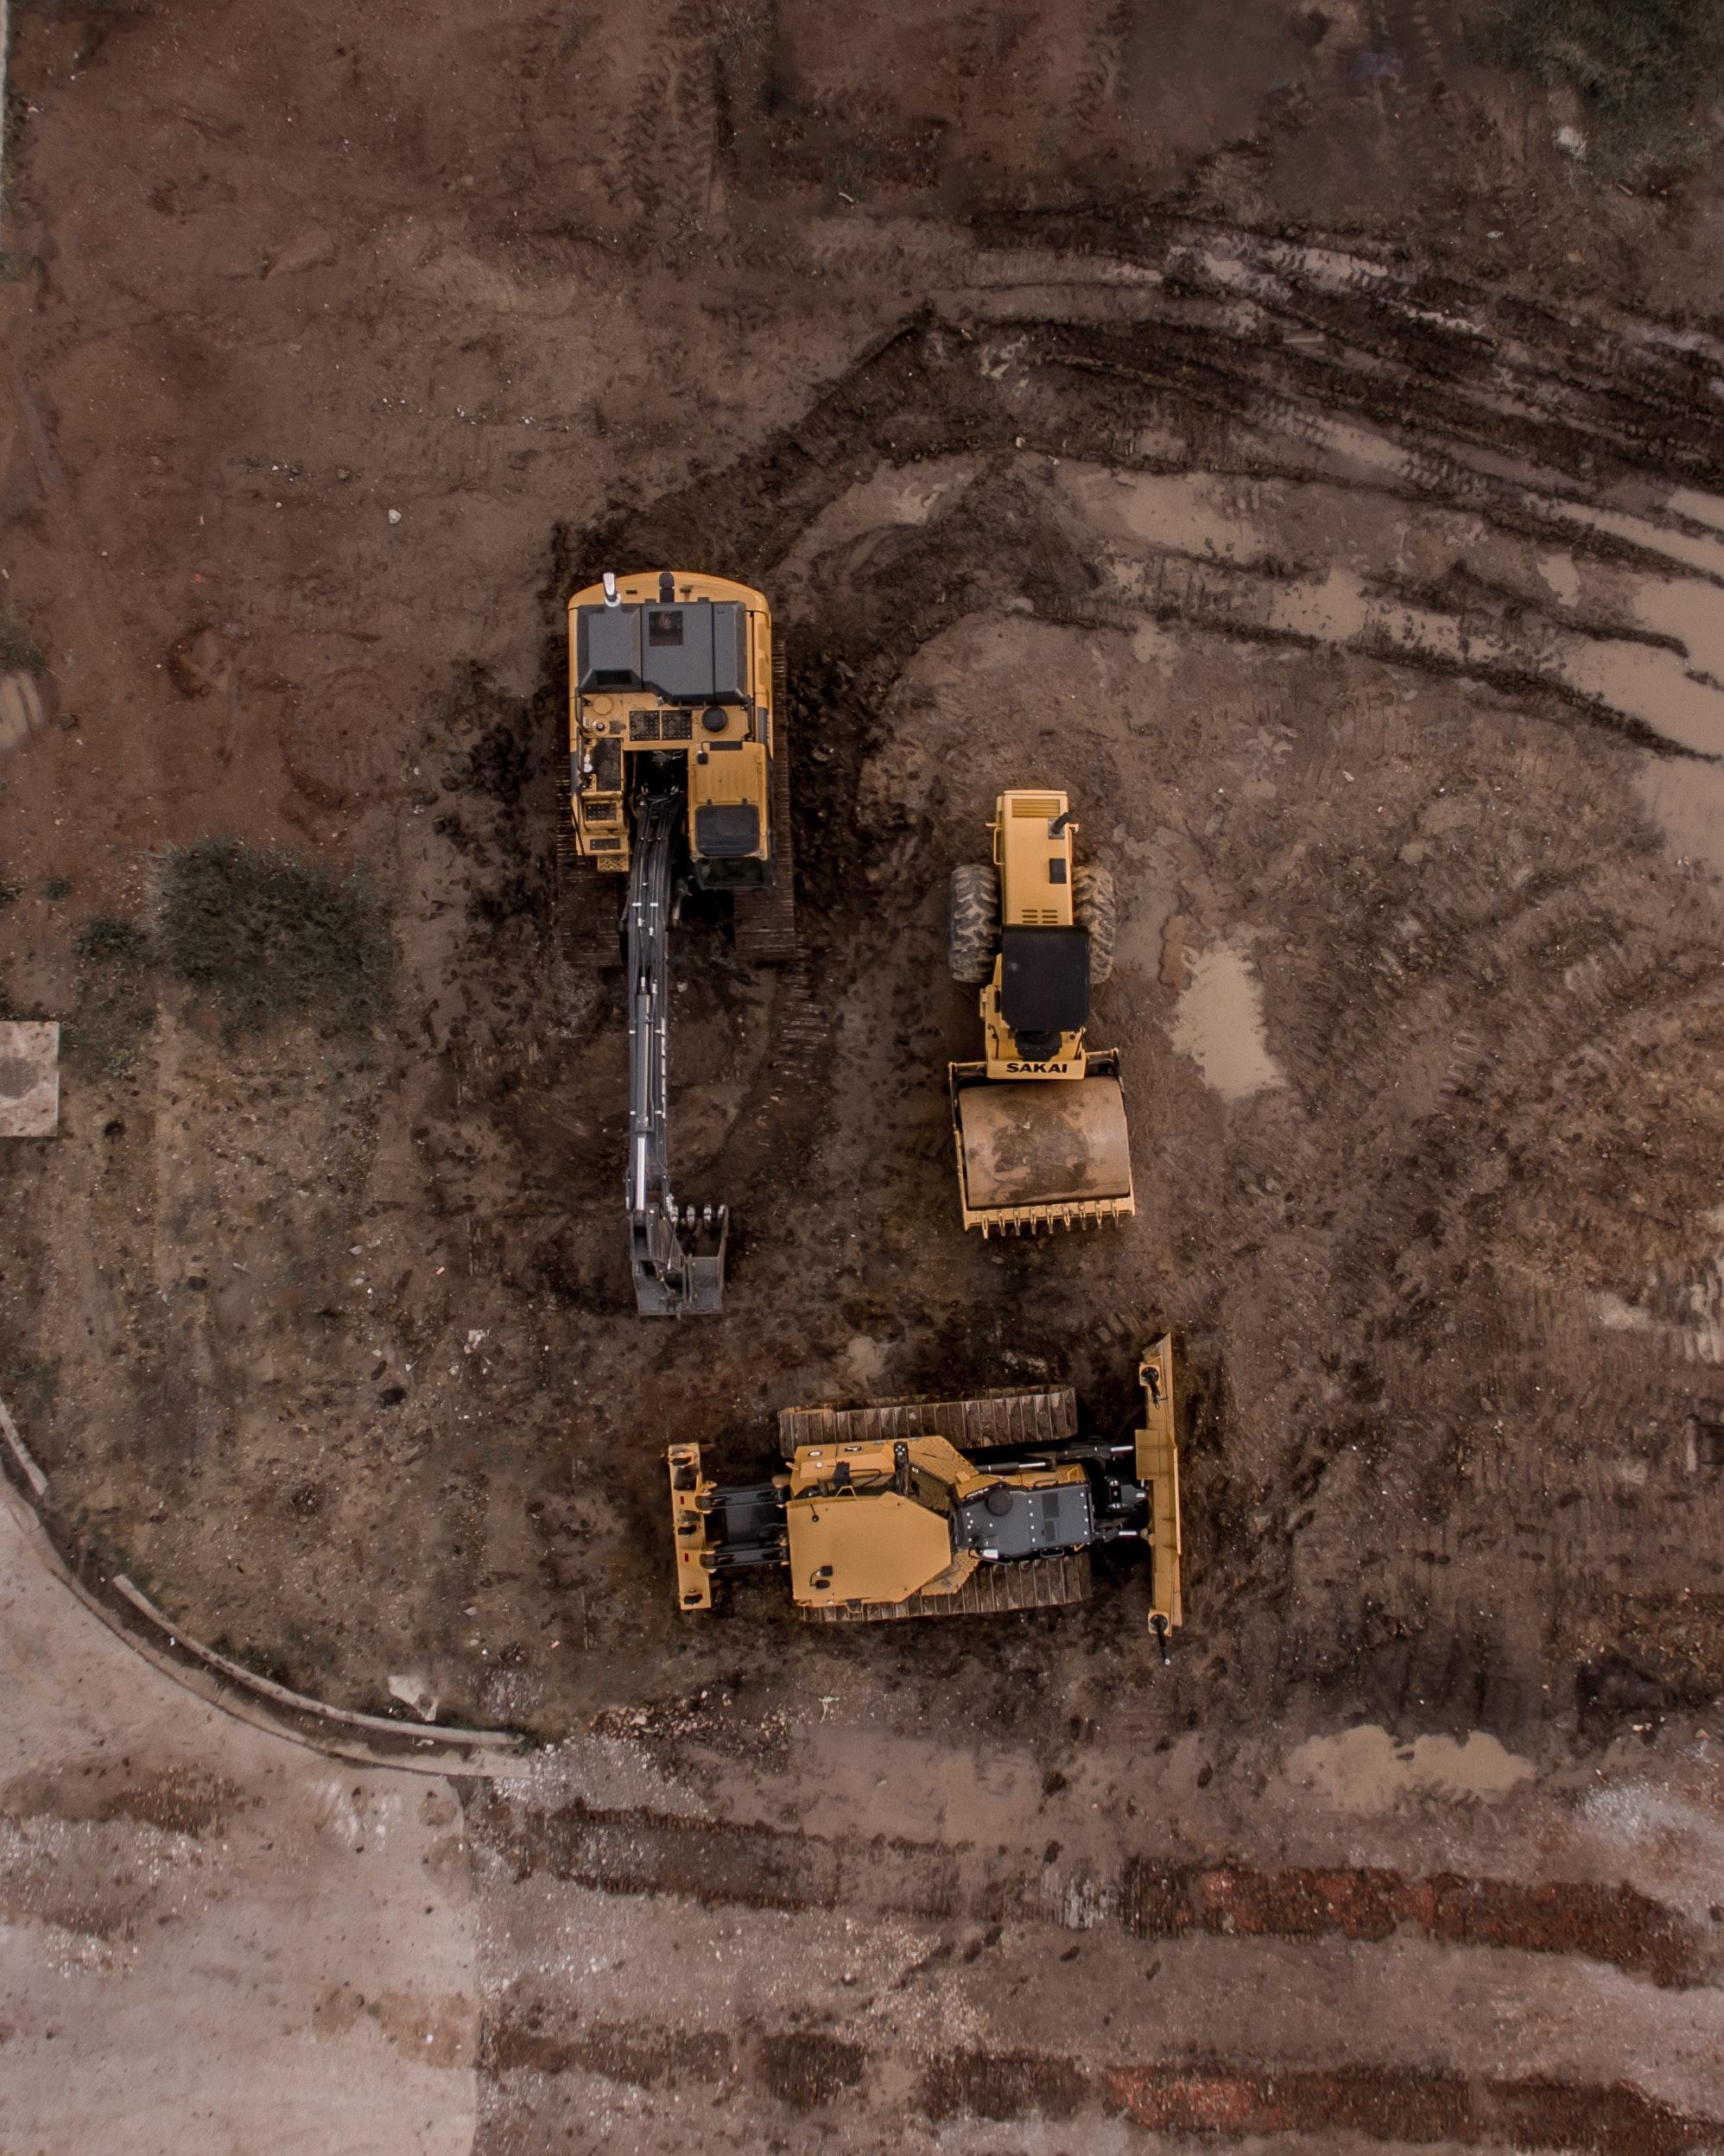 aerial-photo-of-excavator-road-roller-and-bulldozer-1579356